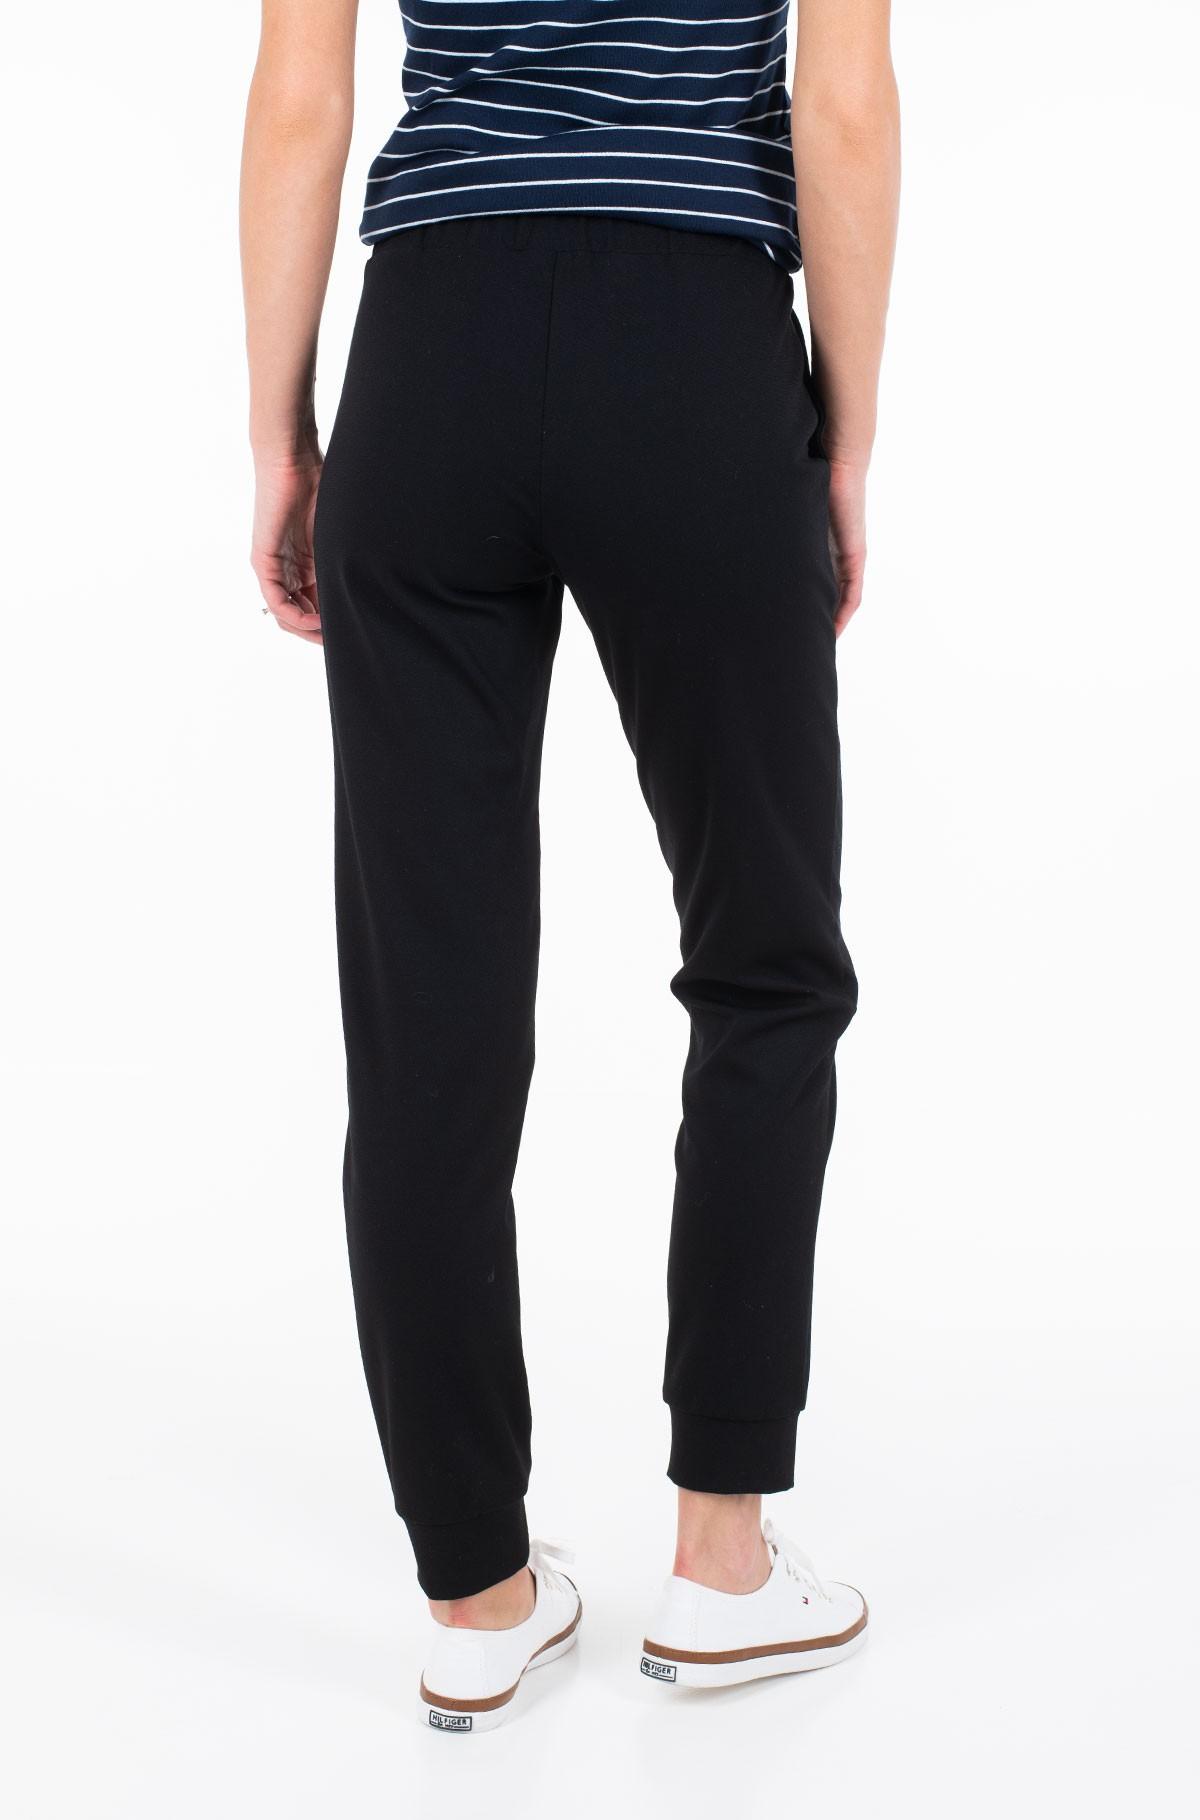 Sportinės kelnės Rutt-full-2